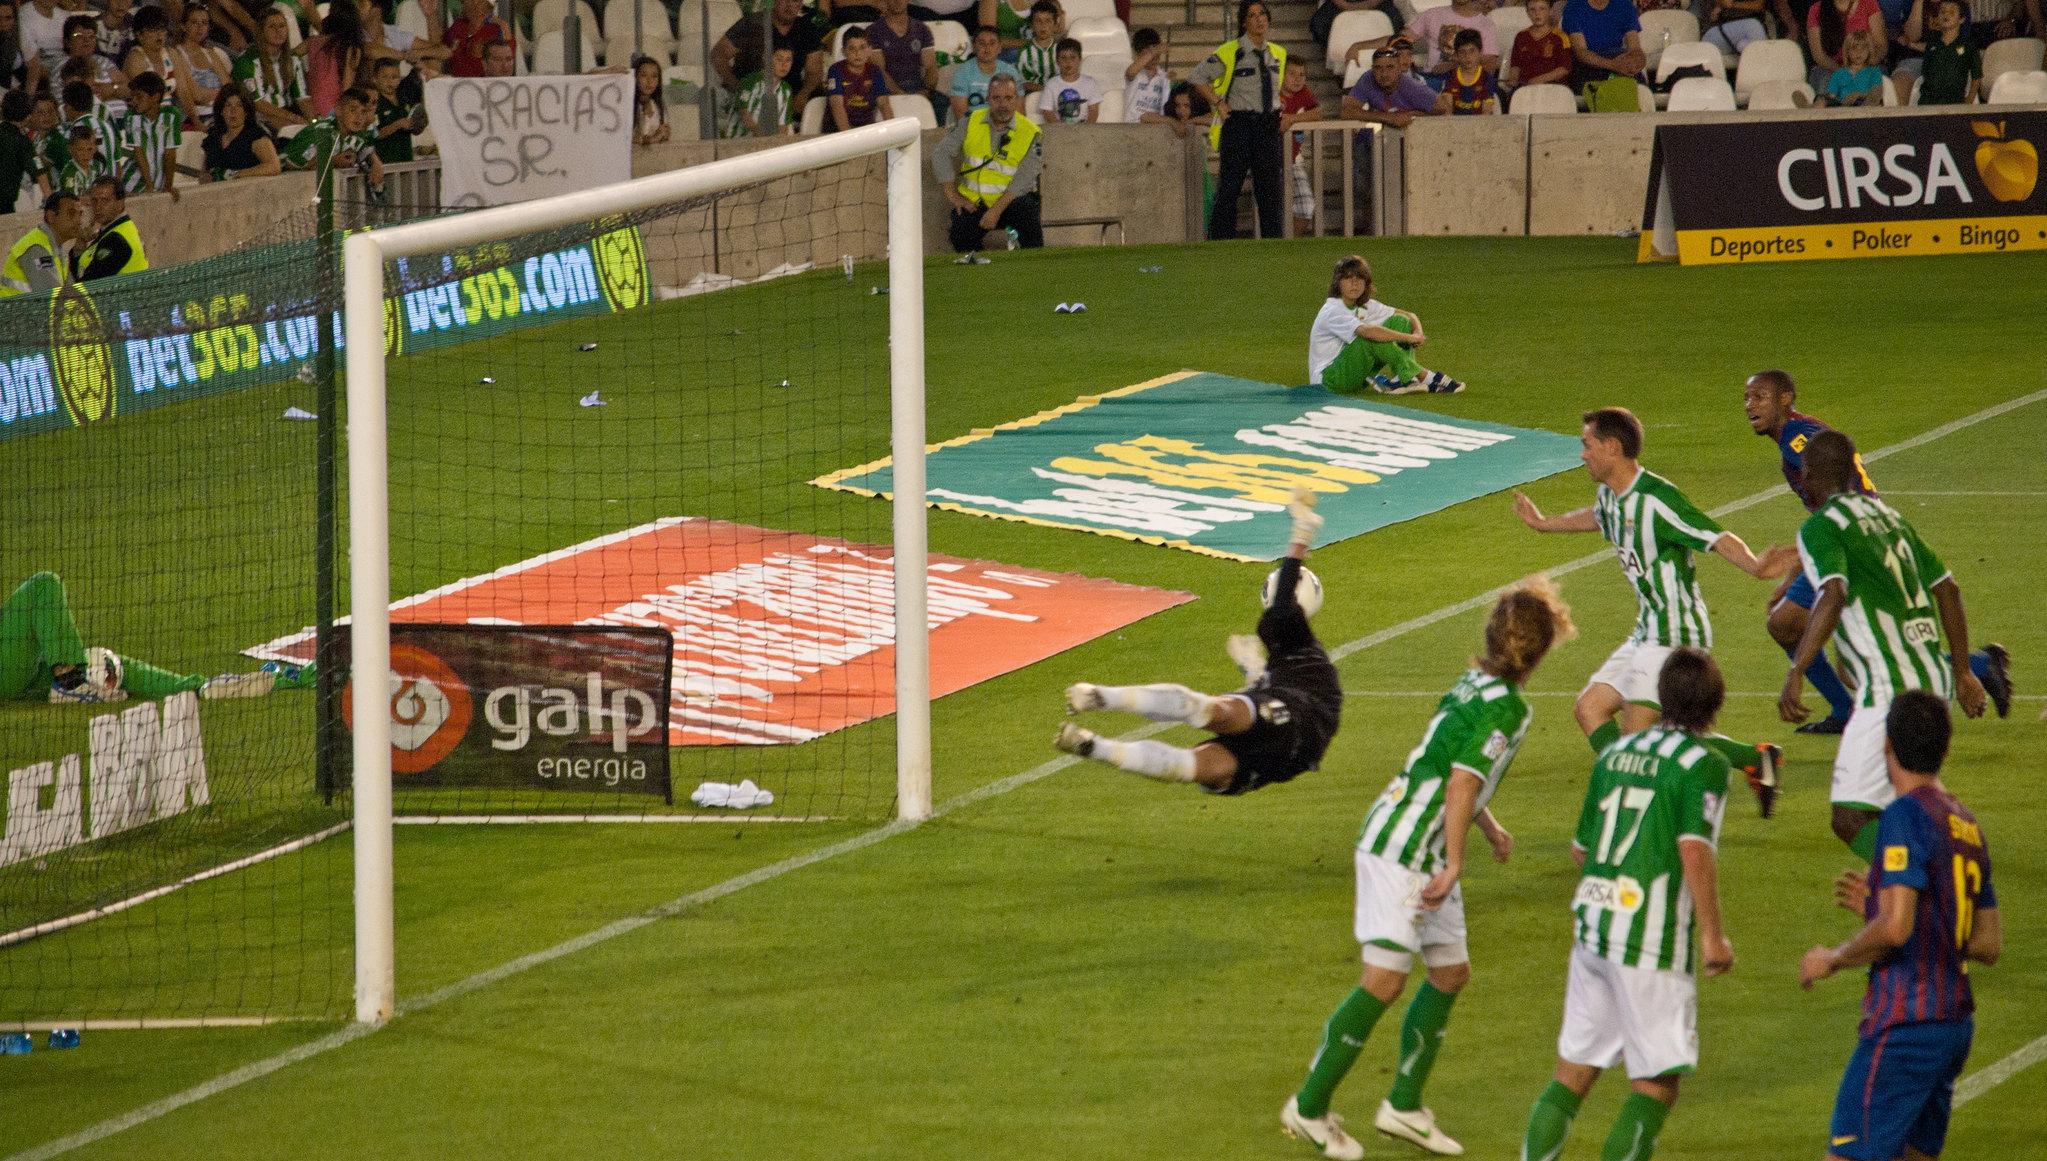 Spanish La Liga to resume from June 8